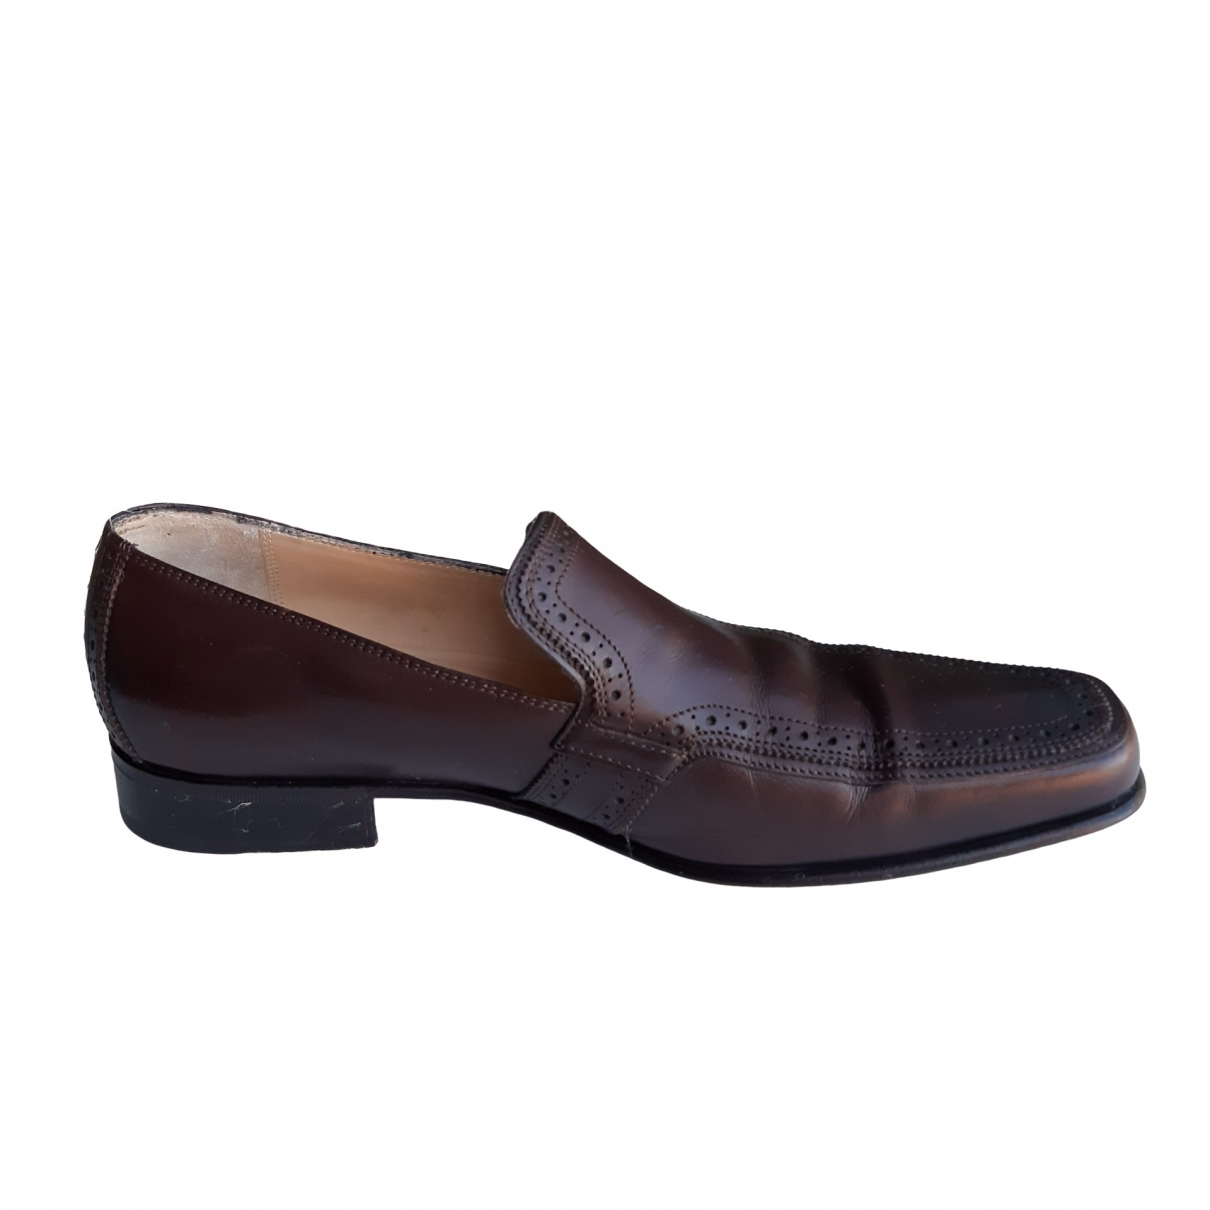 Salvatore Ferragamo \N Brown Leather Flats for Men 43.5 EU